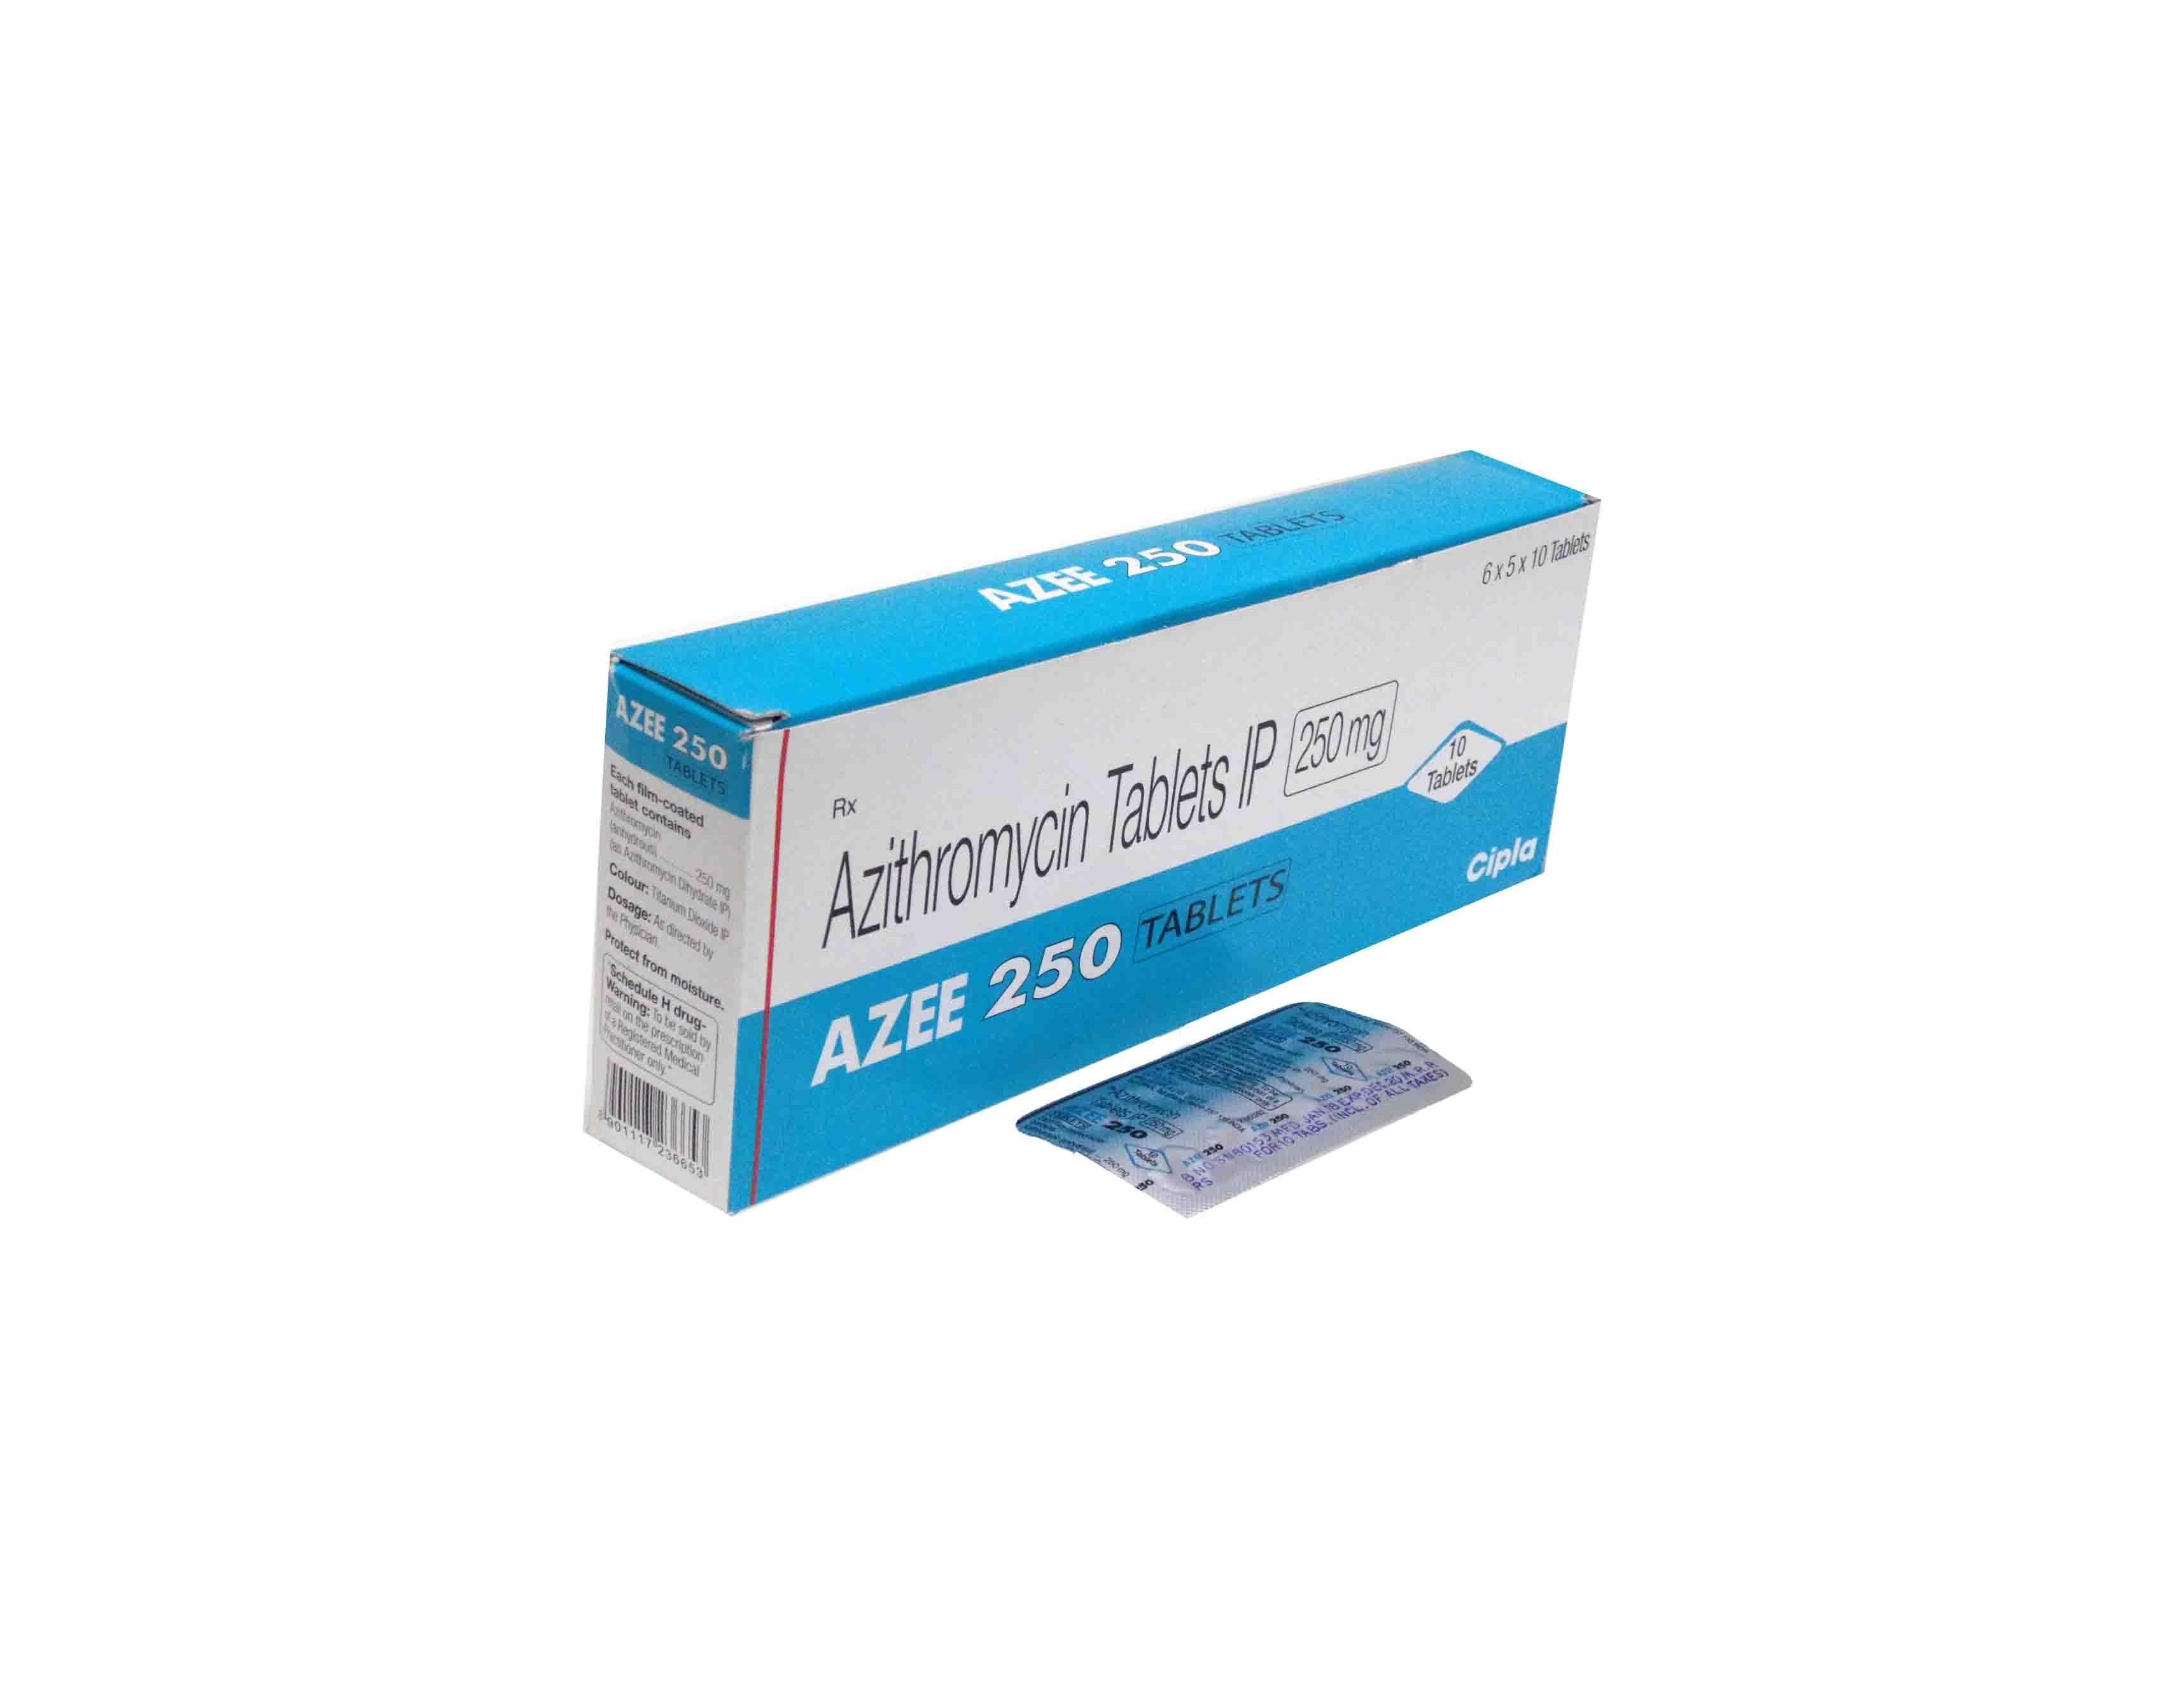 comprar zithromax 250mg tableta